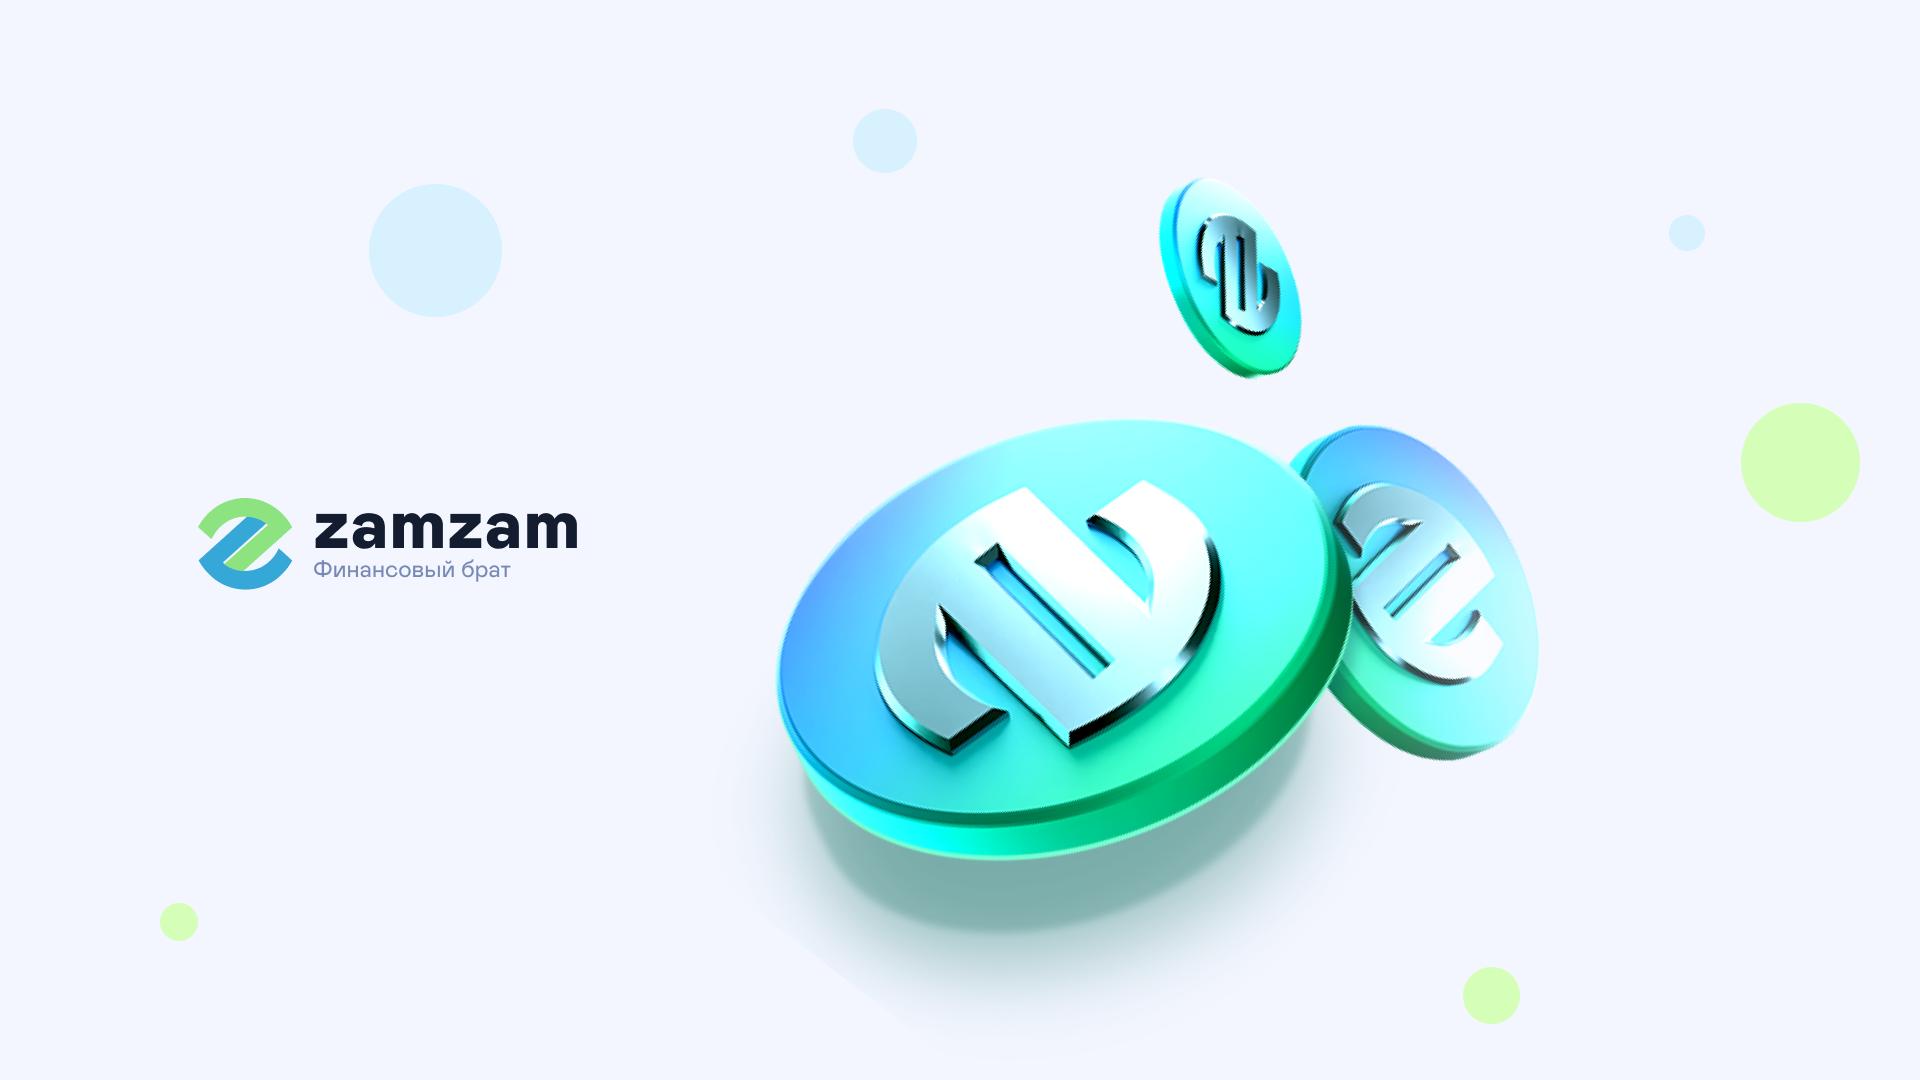 kriptovaljuta zam   novyj investicionnyj instrument1 - Криптовалюта $ZAM – новый инвестиционный инструмент